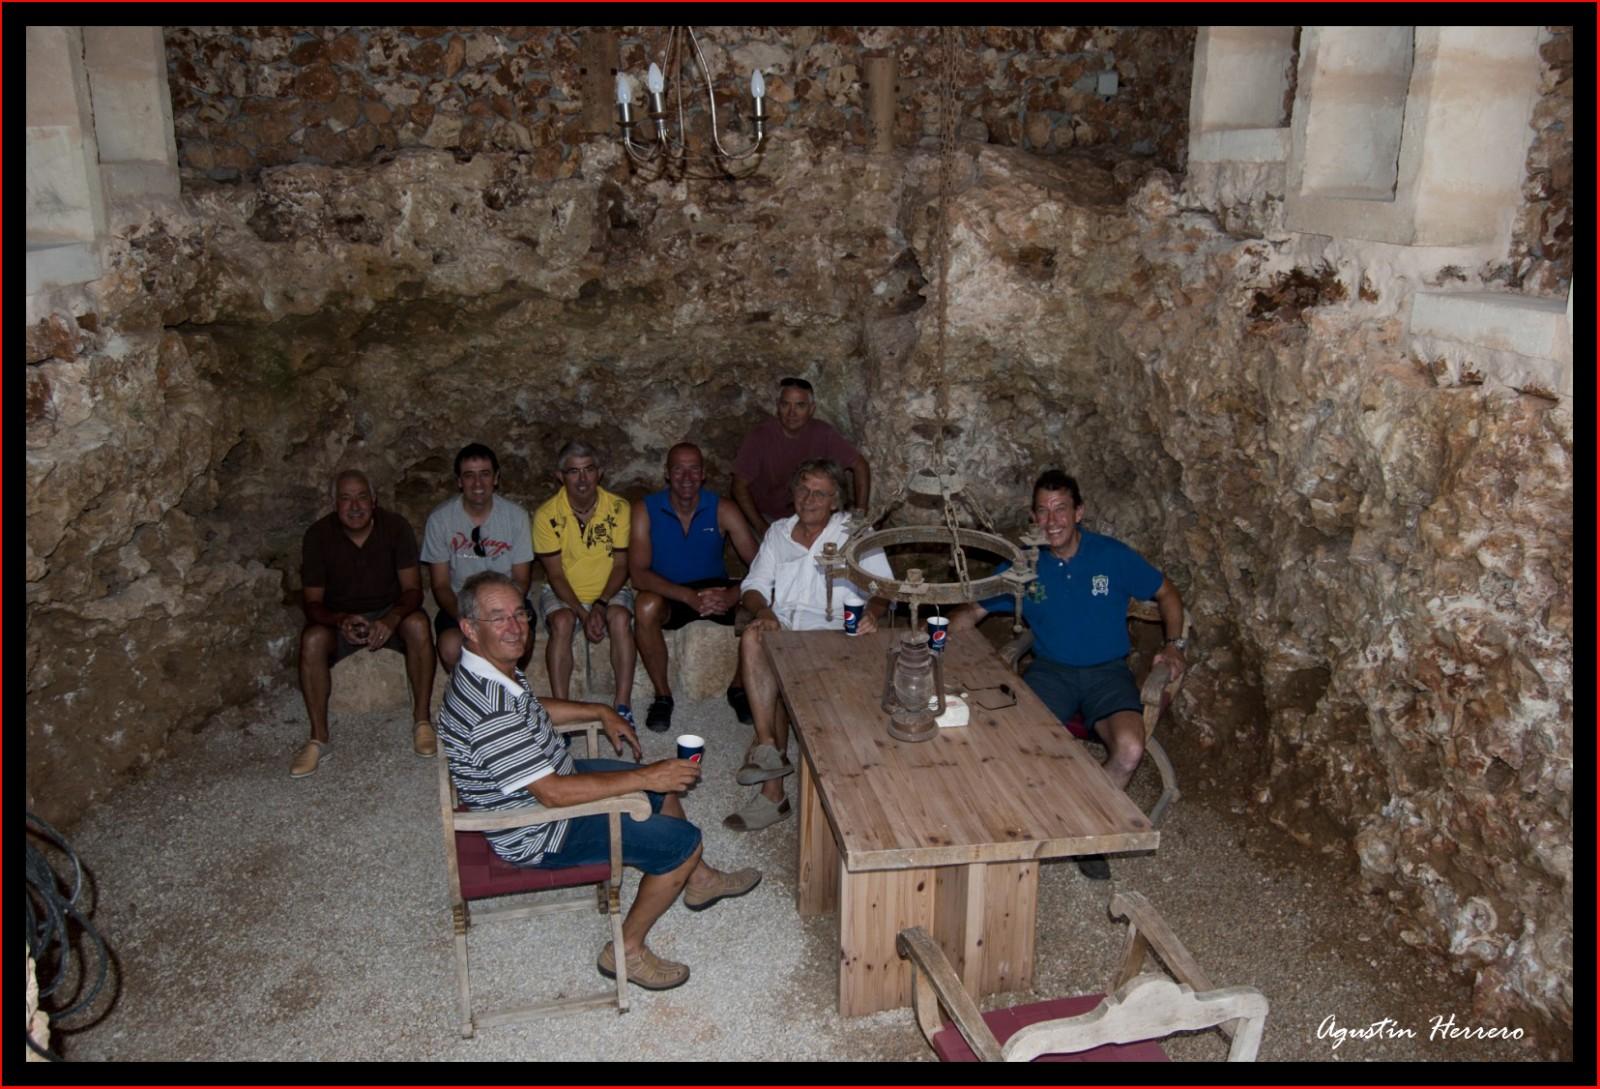 2011-07-17-ludwic-house-1